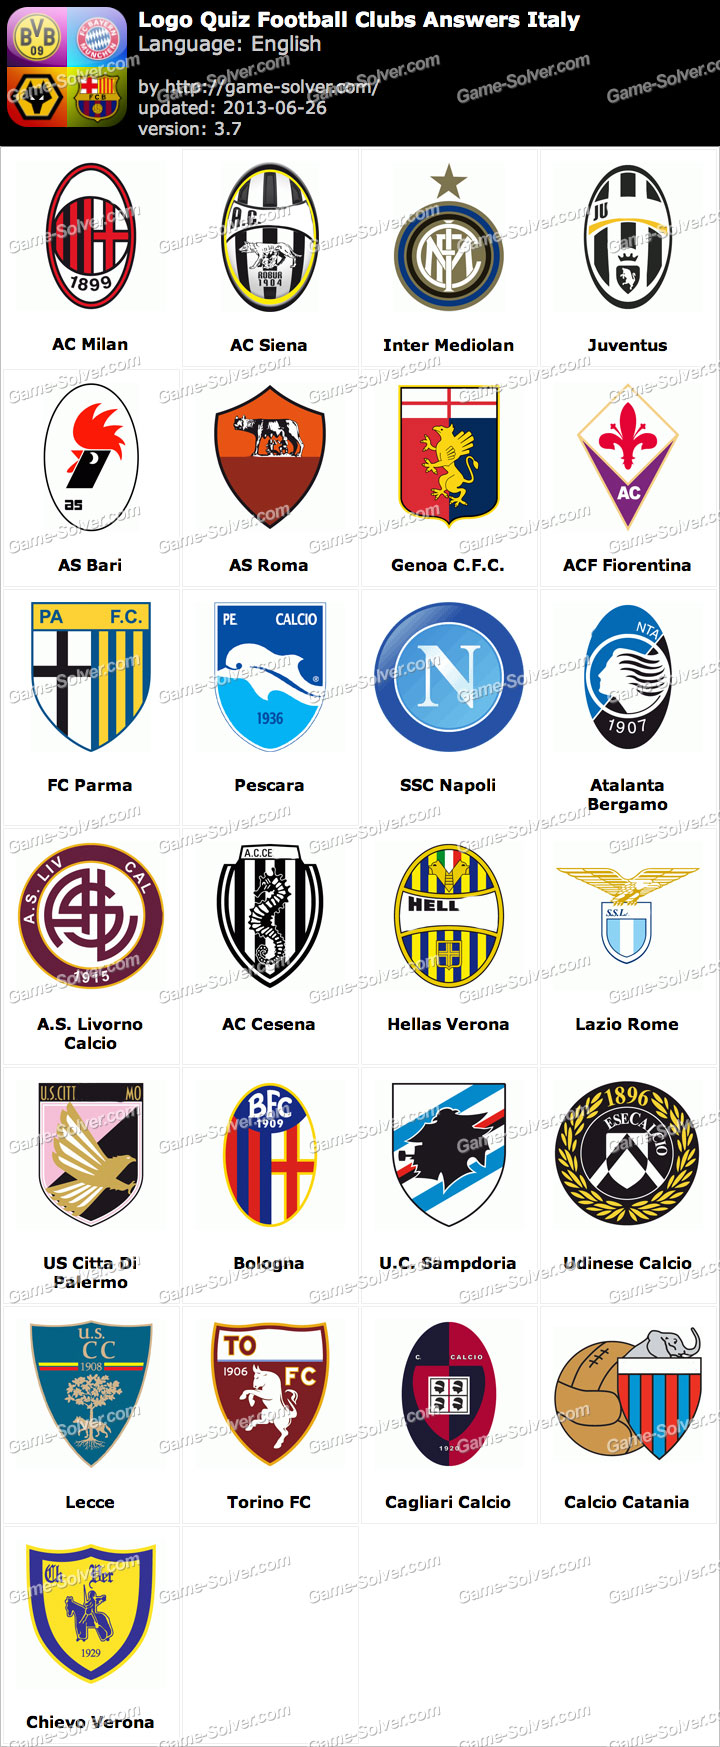 Logo Quiz Football Clubs Answers Italy.